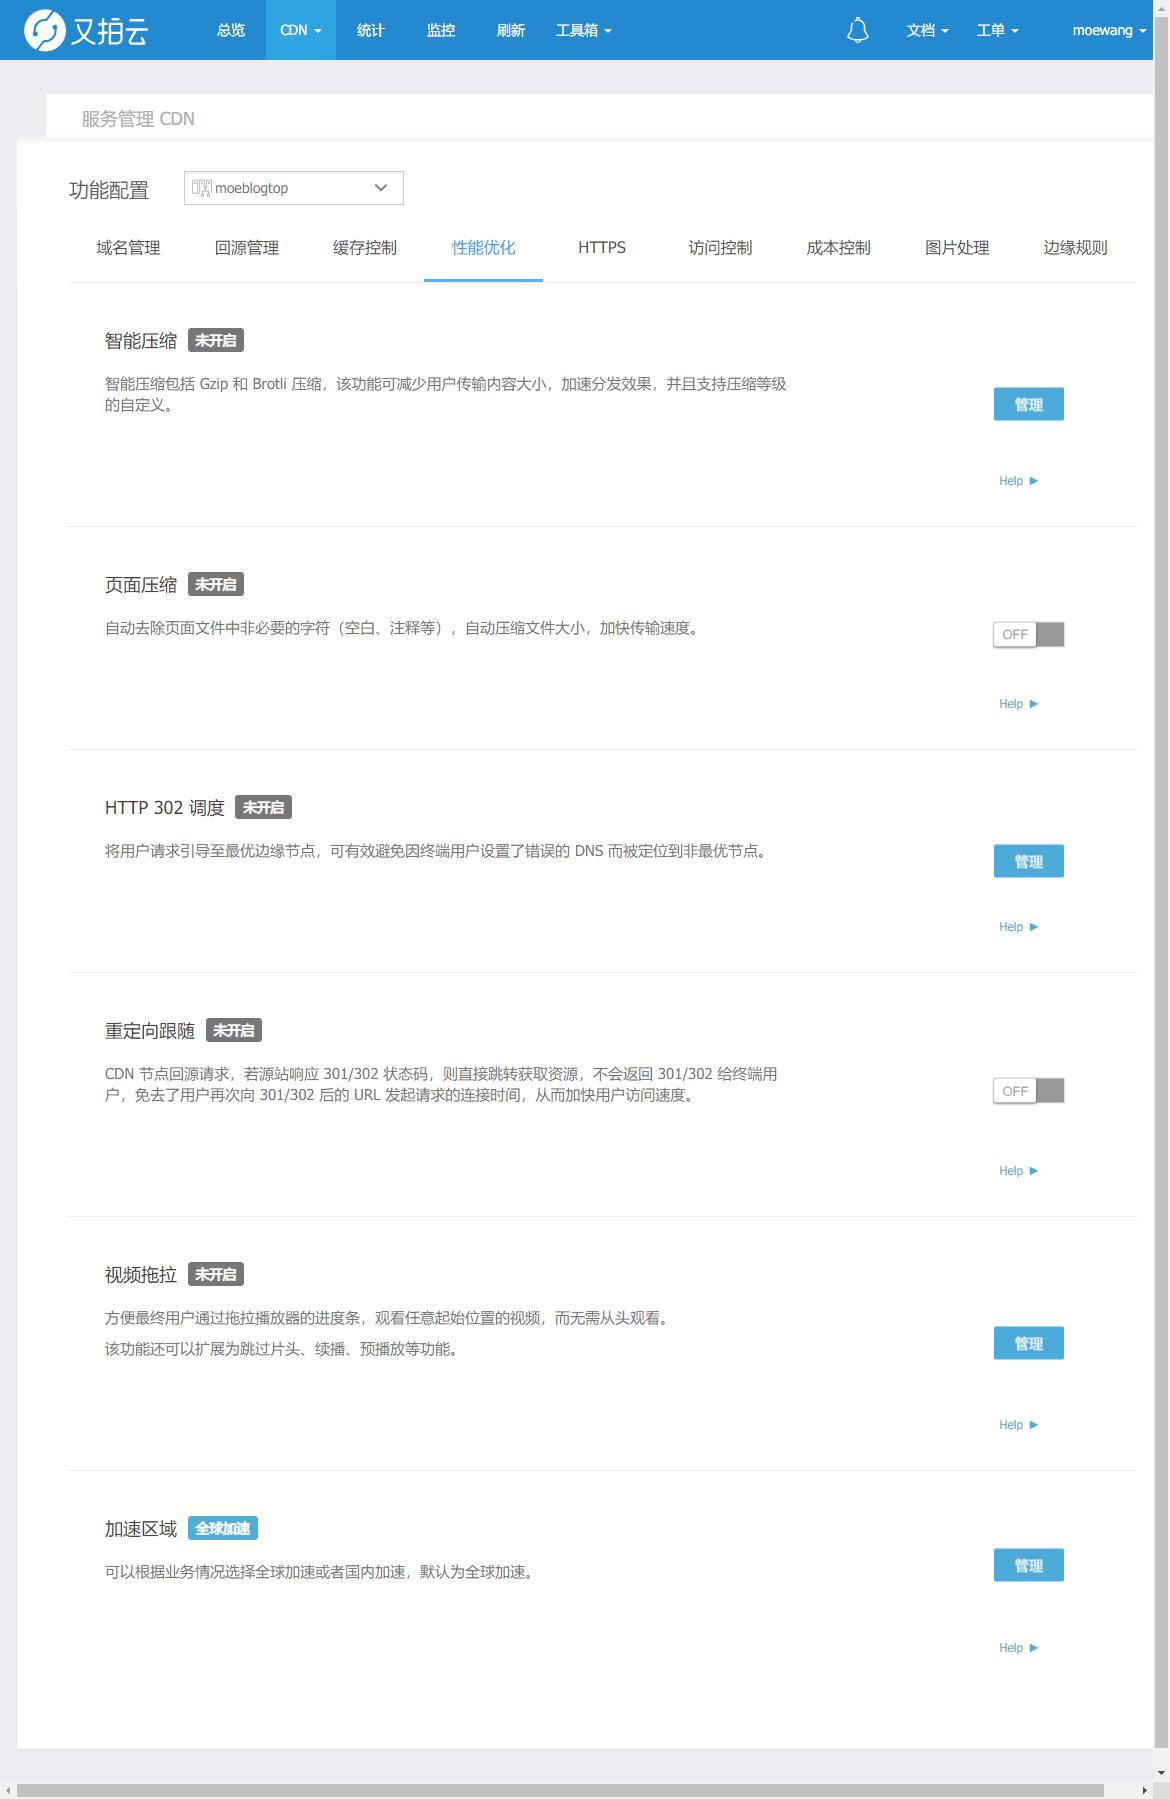 console.upyun.com_services_moeblogtop_optimizeCdn_.png